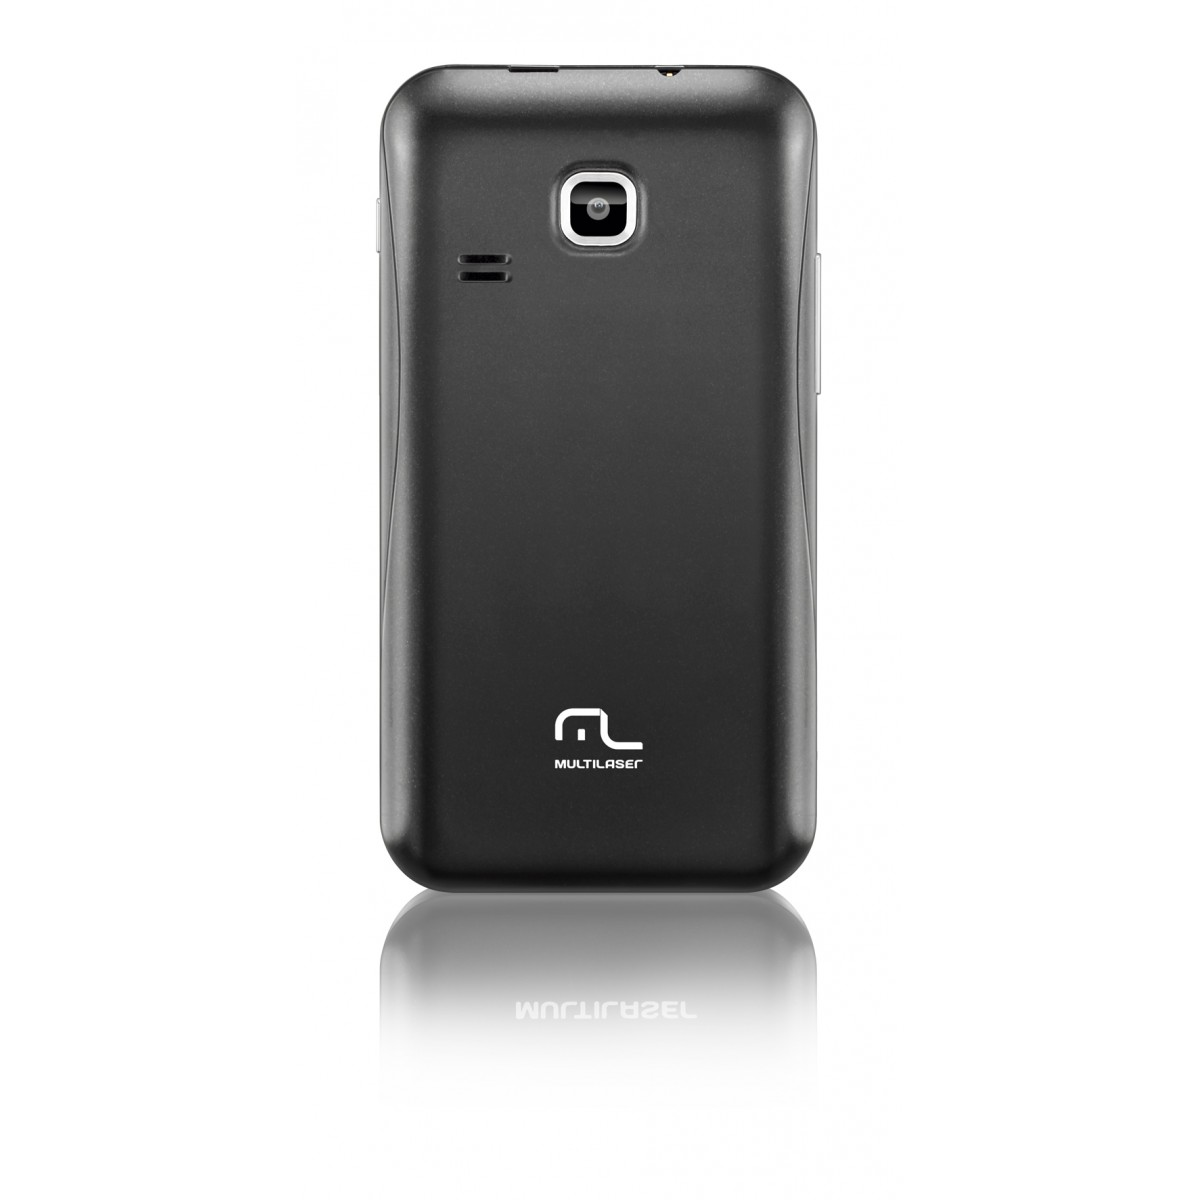 Smartphone Orion Dual Chip P3181 3G Android 2.3 Tela de 3.5 - Multilaser